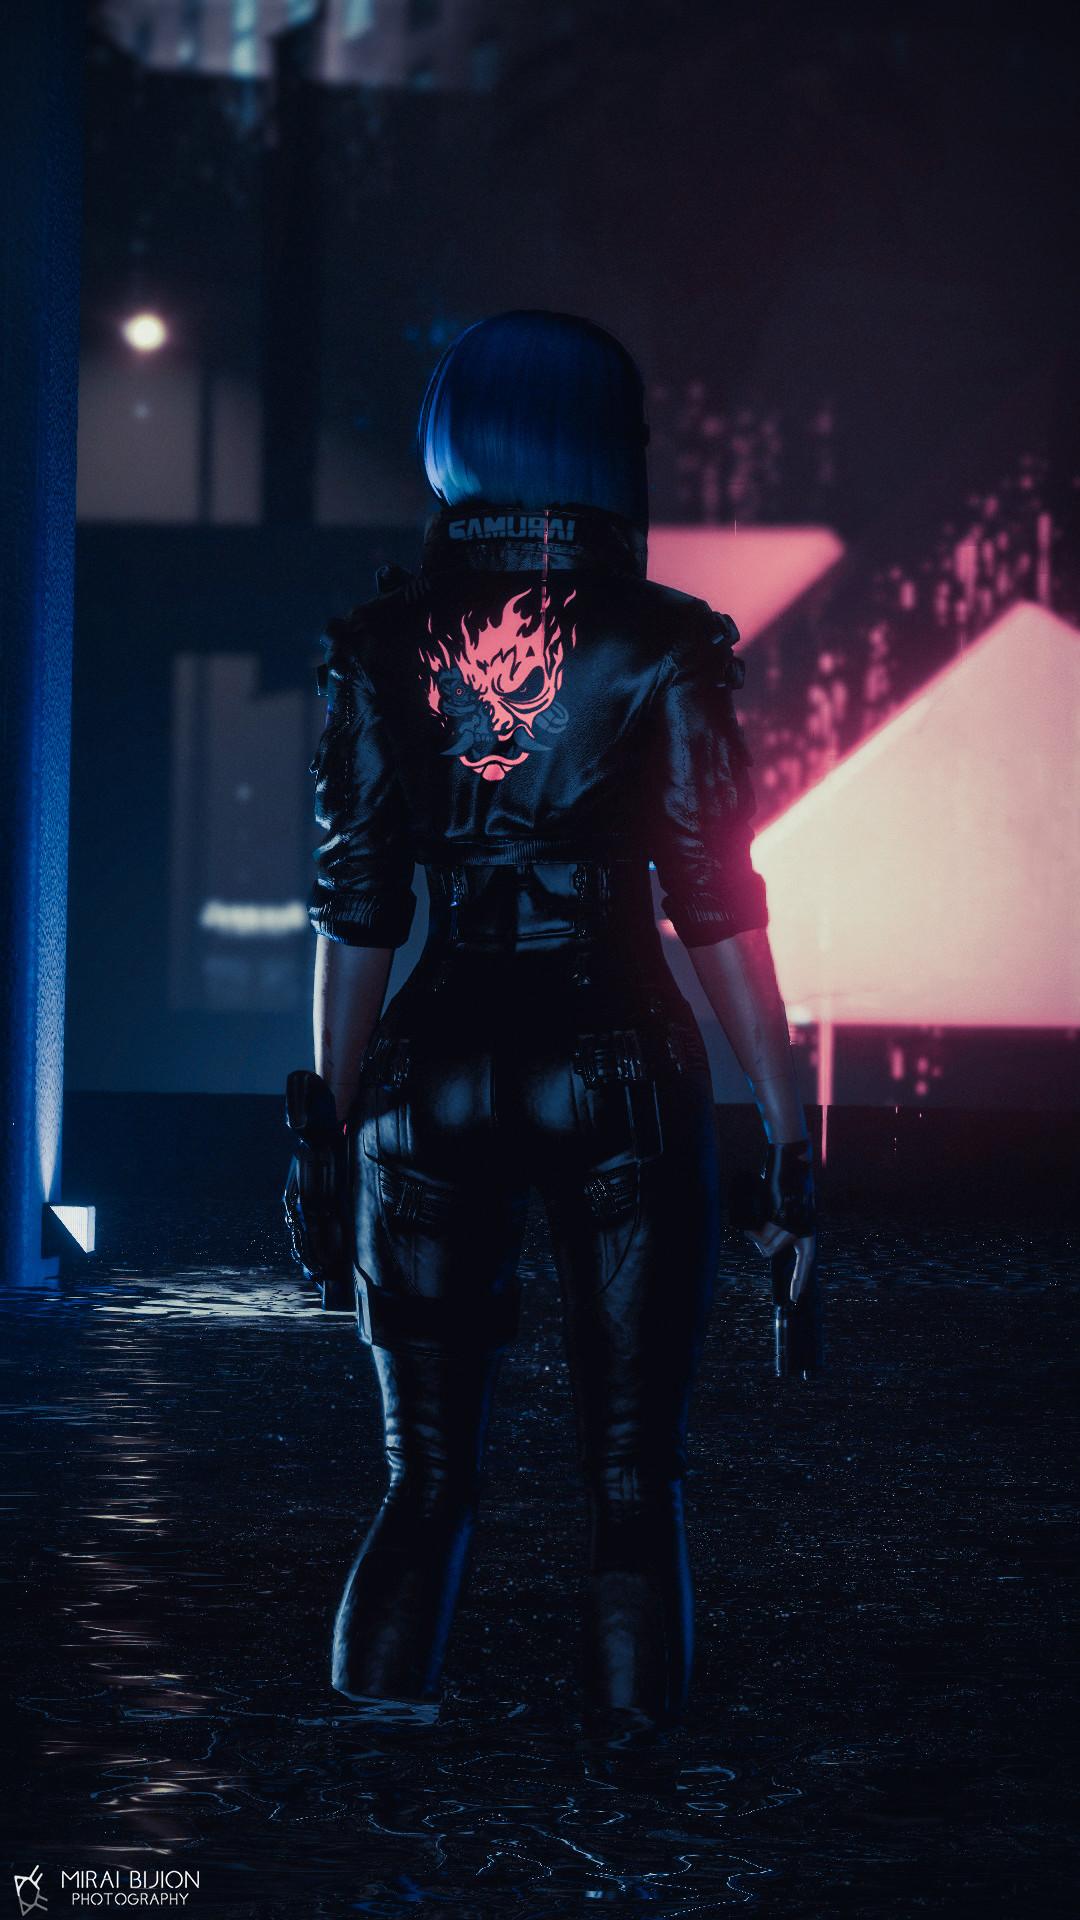 retribution - Cyberpunk 2077